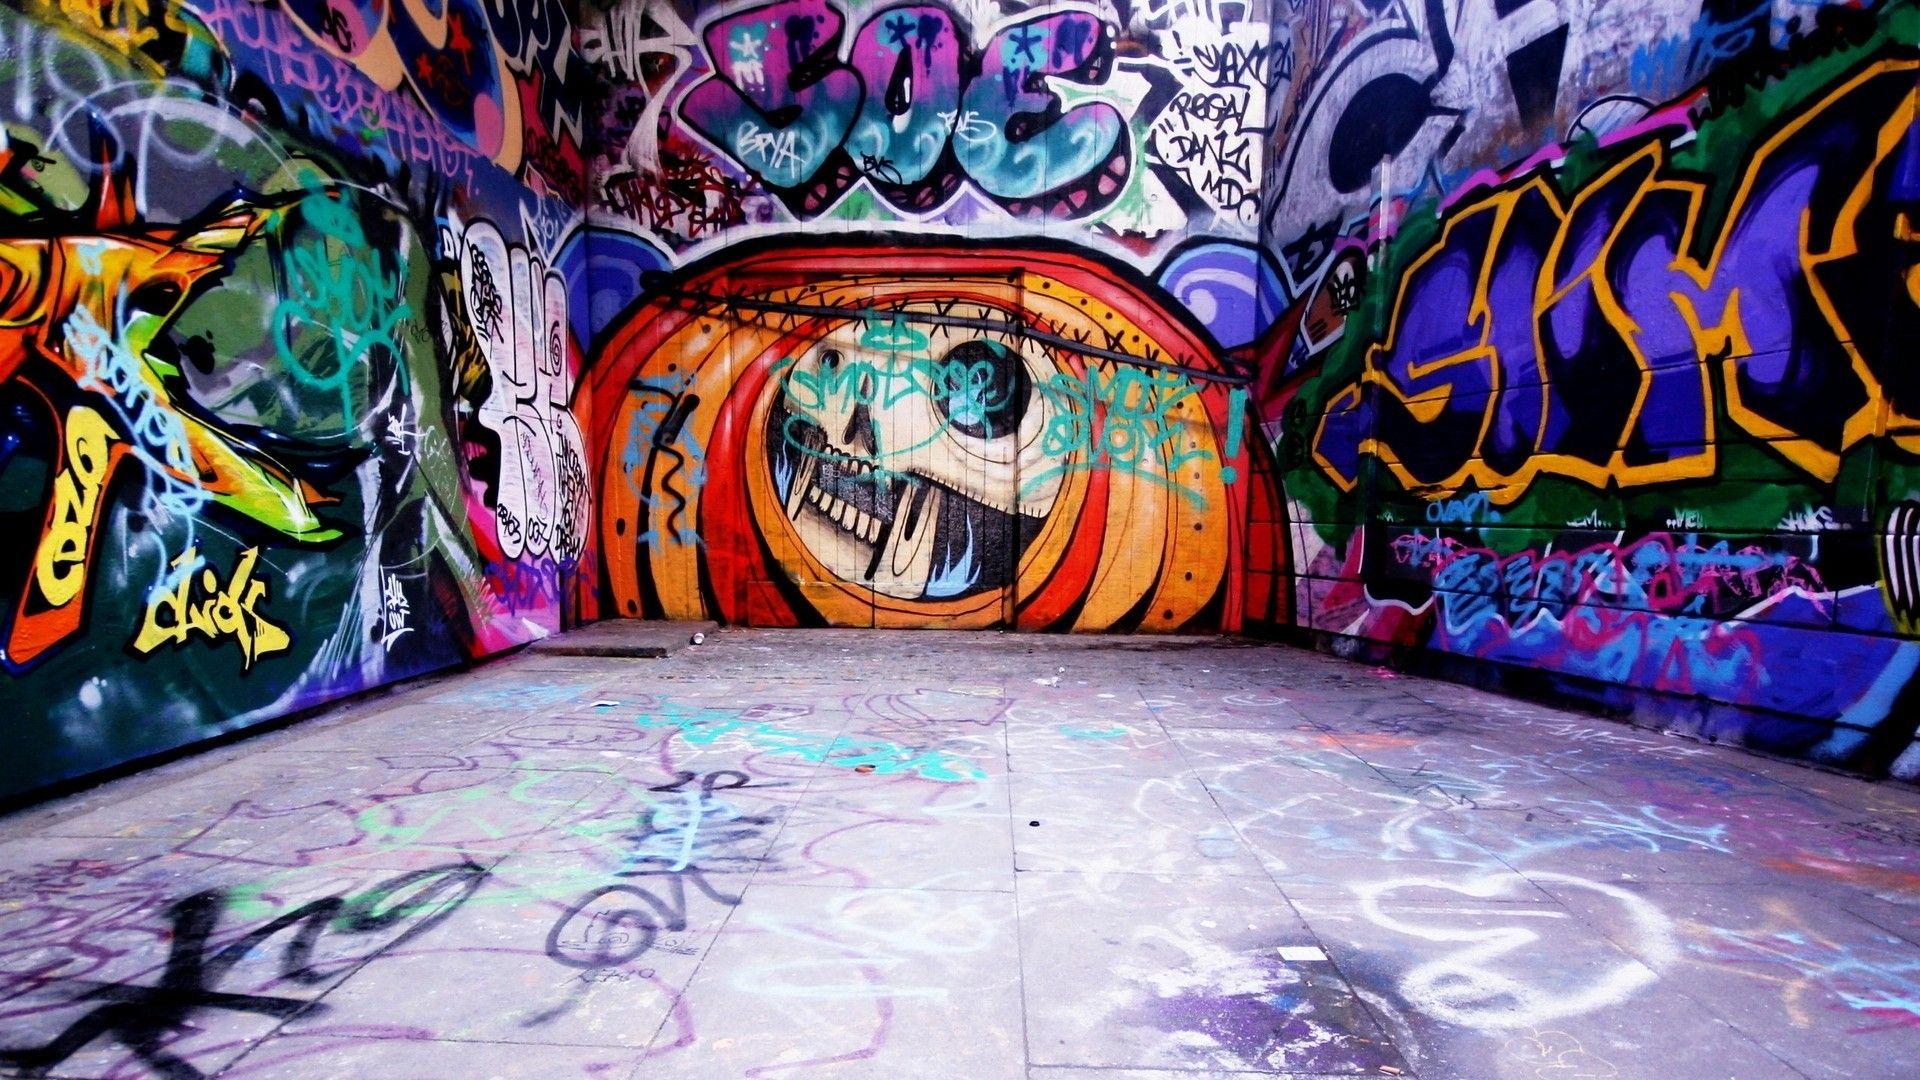 Graffiti wall tokyo - Hd Graffiti Wallpapers Wallpaper Hd Wallpapers Pinterest Graffiti Wallpaper Graffiti And Wallpaper